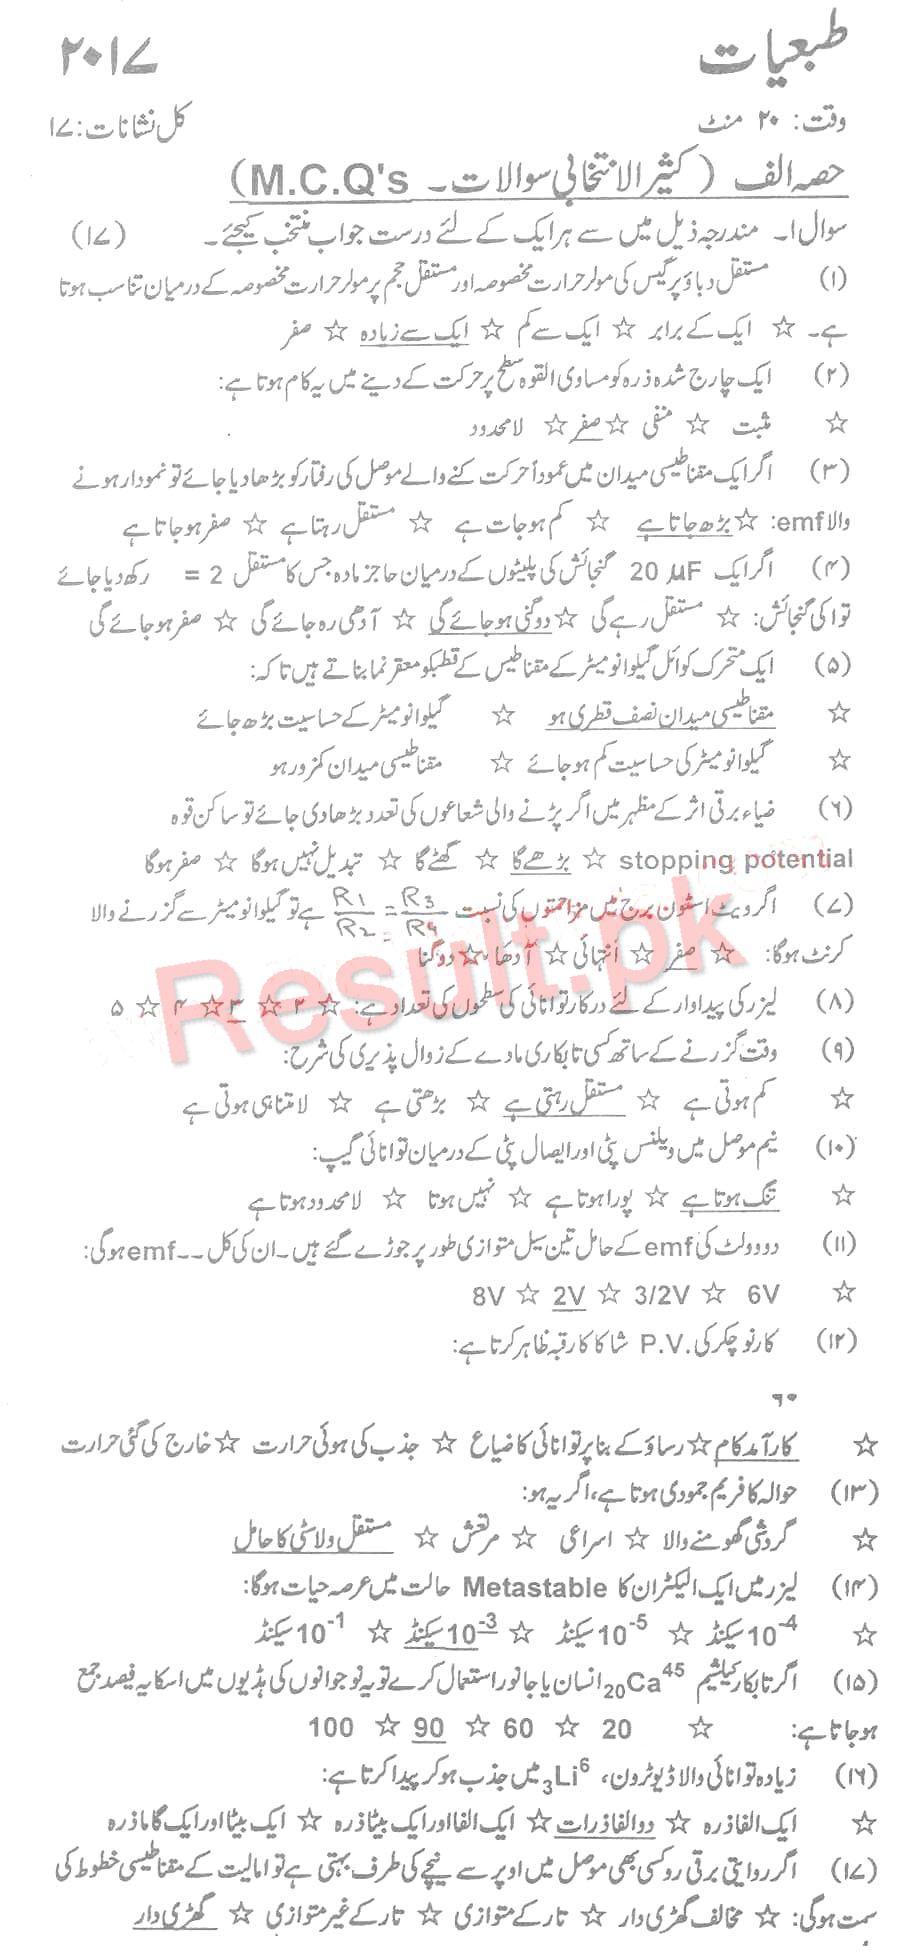 BIEK Karachi Board Past Papers 2019 Inter Part 1 2, FA, HSSC, FSC